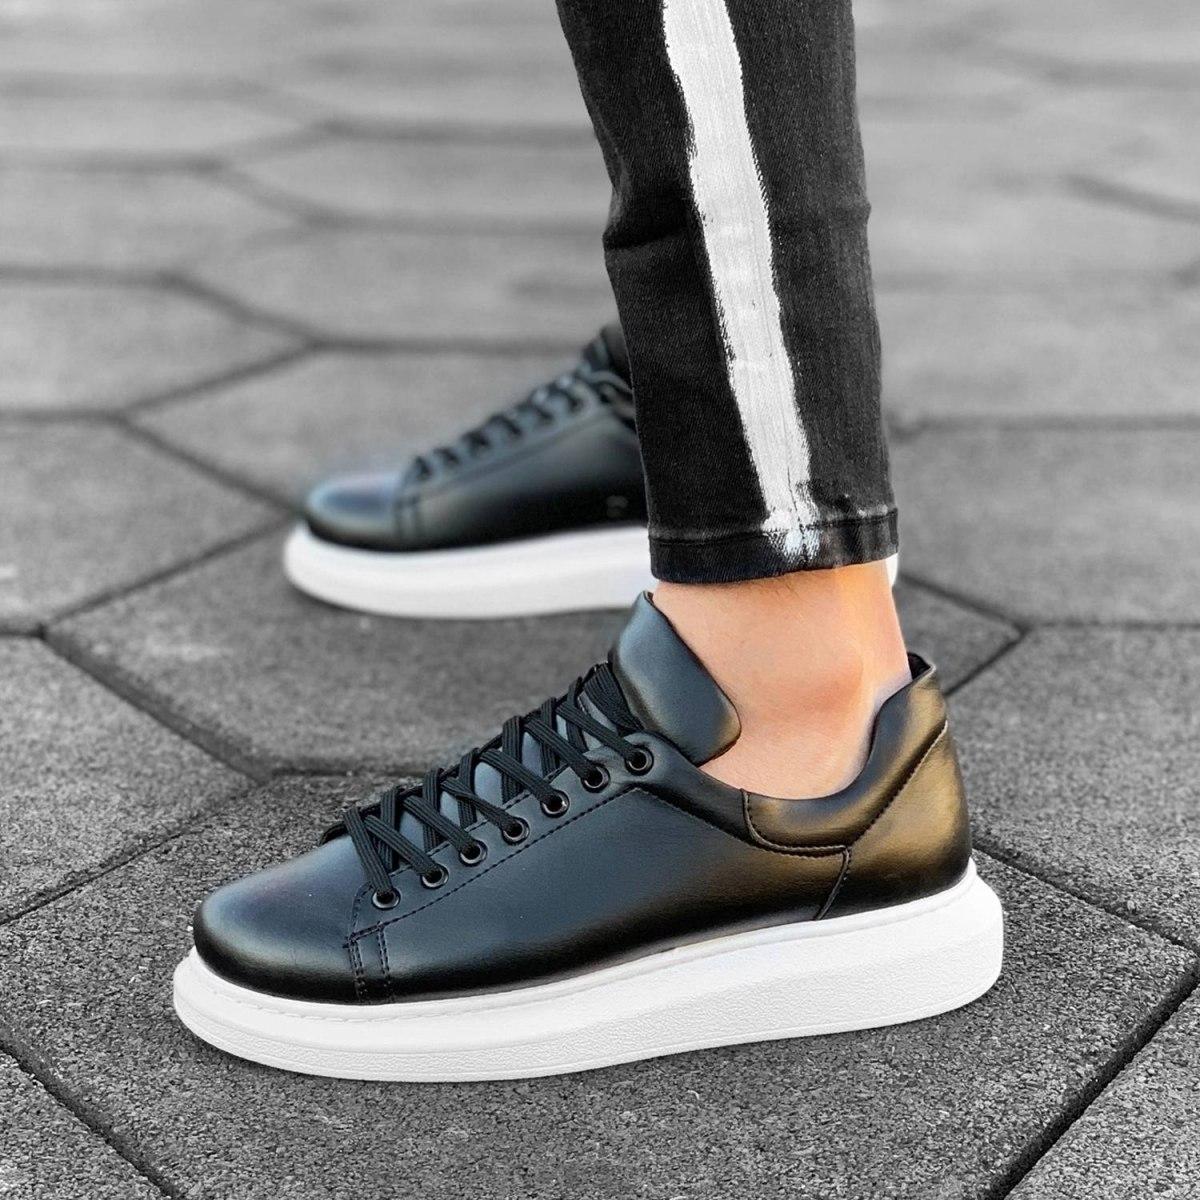 MV Mega Sole in Matte Black&White Sneaker MV Sneaker Collection - 2